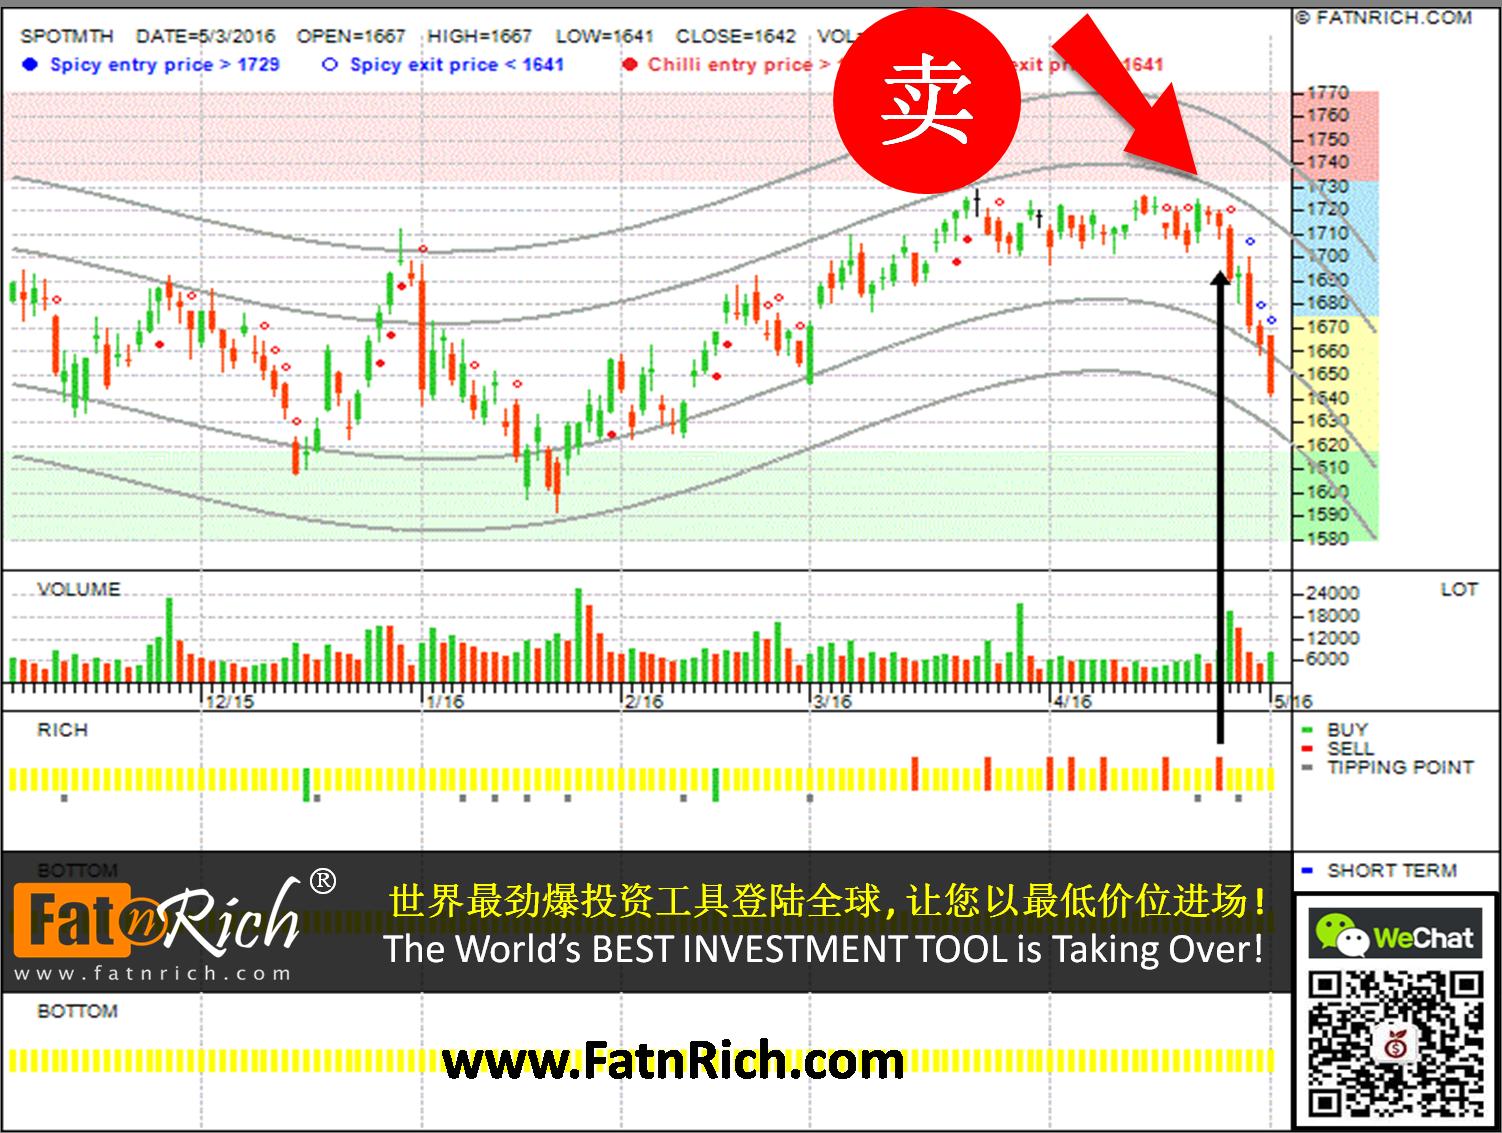 SPOTMTH - 马来西亚期货指数 Futures FKLI